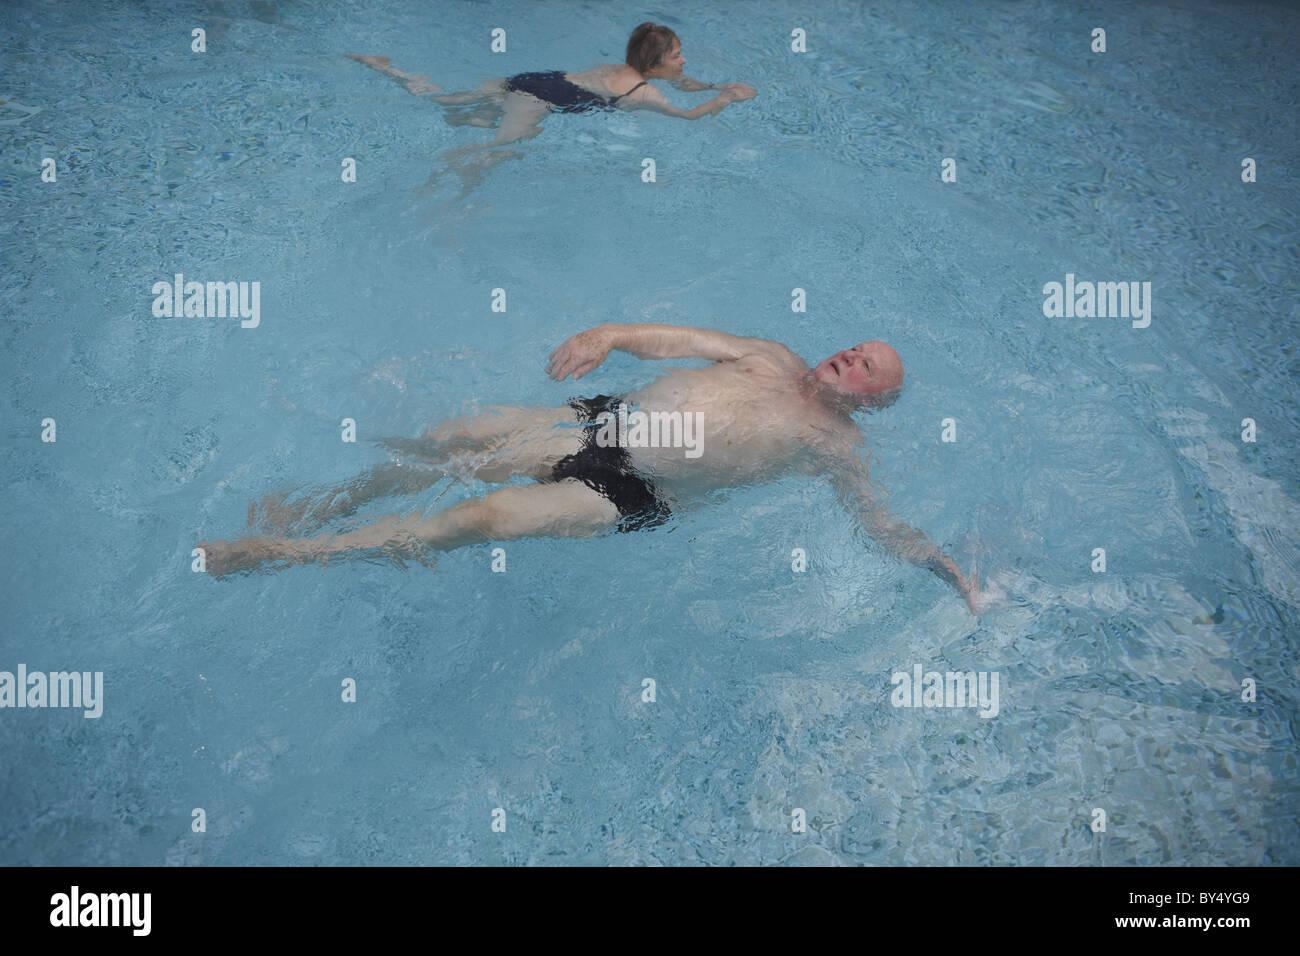 Germany, Bad Saarow, 20110117, men in a worm water basin, ©  Gerhard Leber - Stock Image